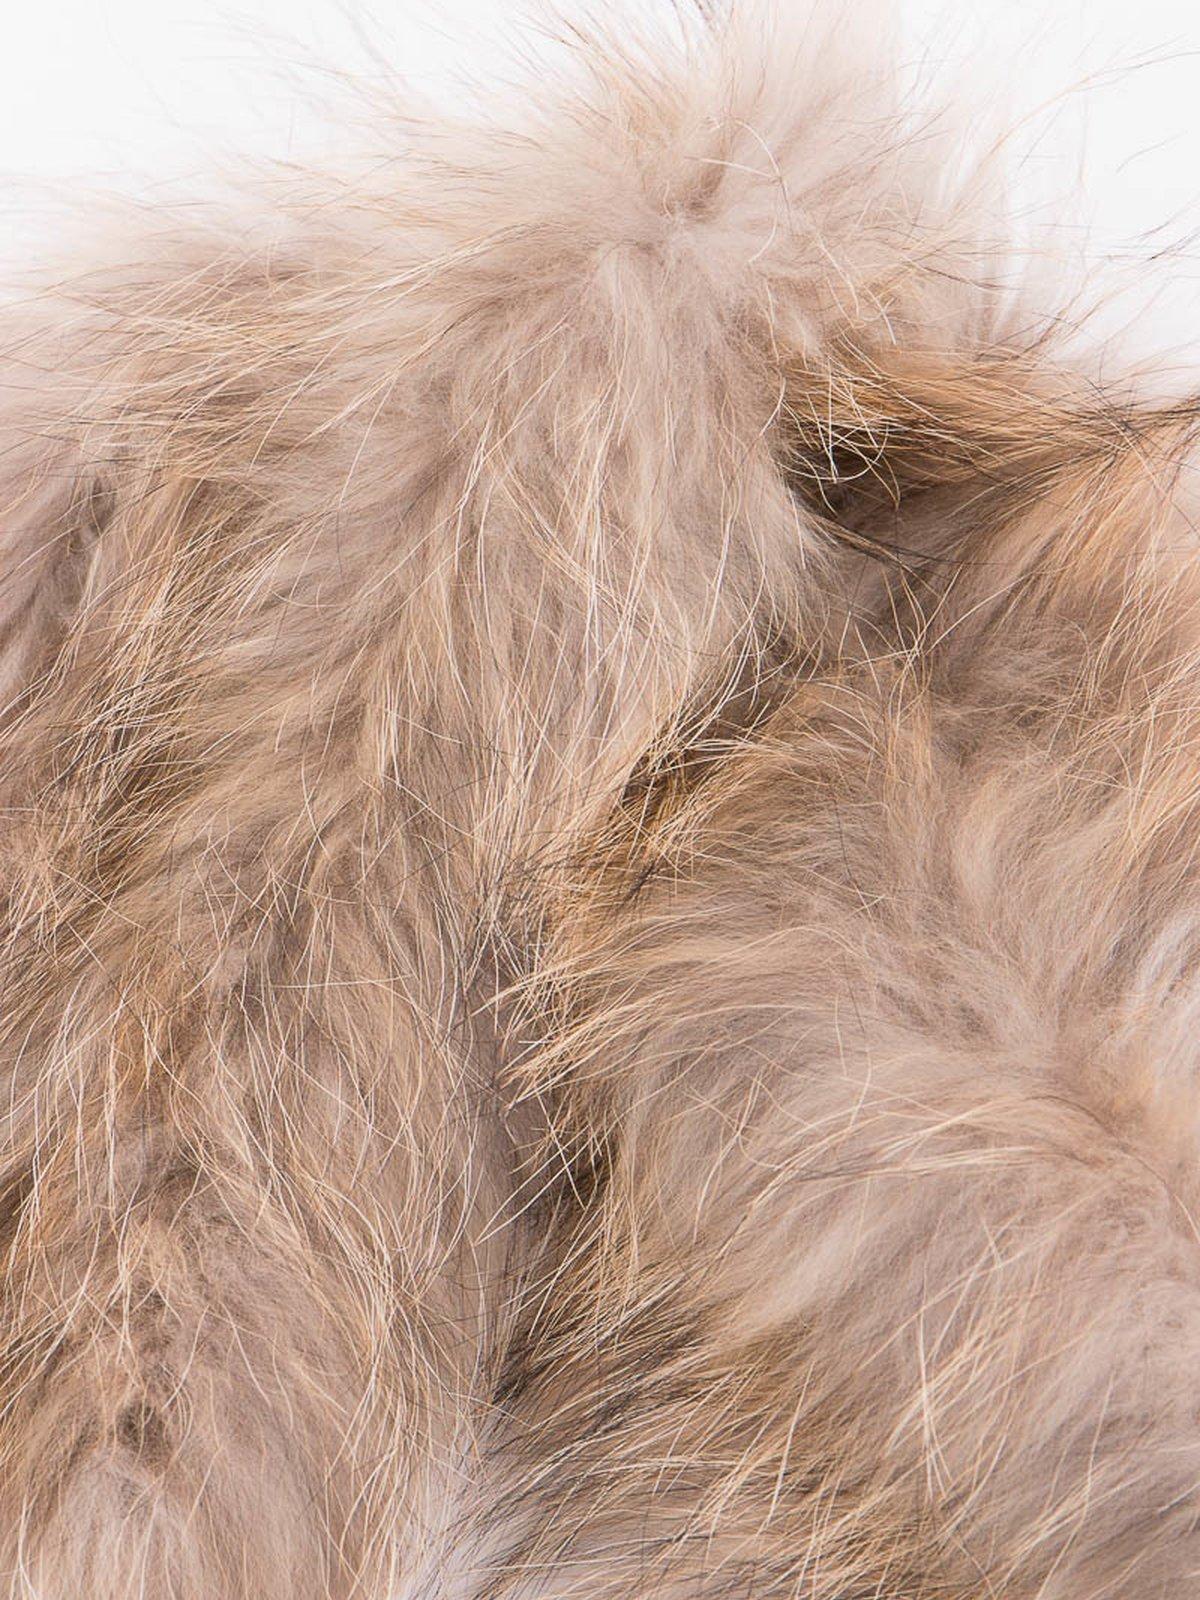 Gold Racoon Furling Coat Scarf - Image 2